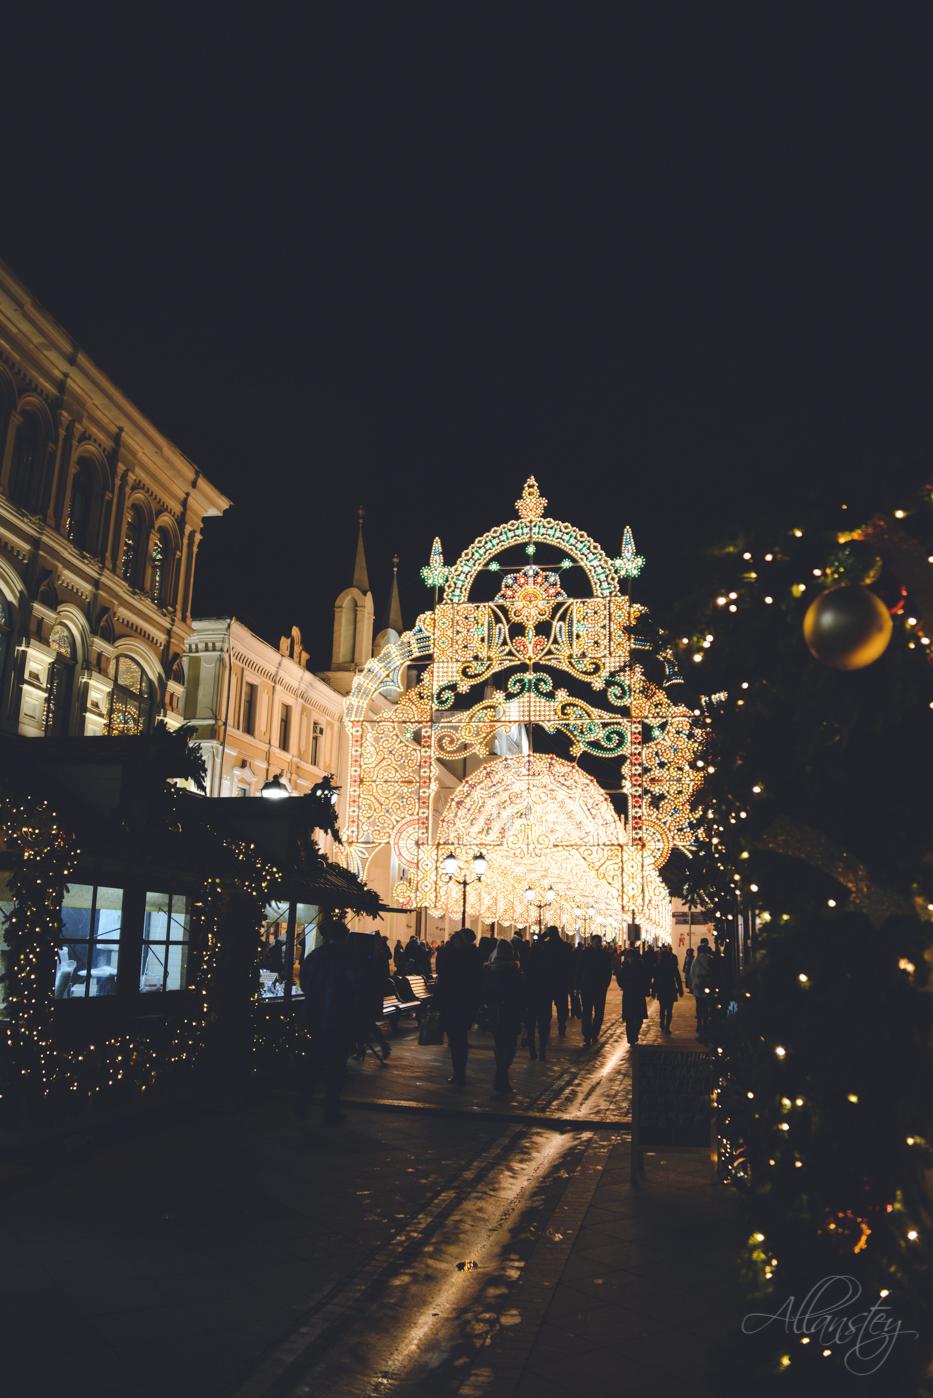 Nikolskaya Street illuminated at night during Chrismas festivities in Moscow, Russia.